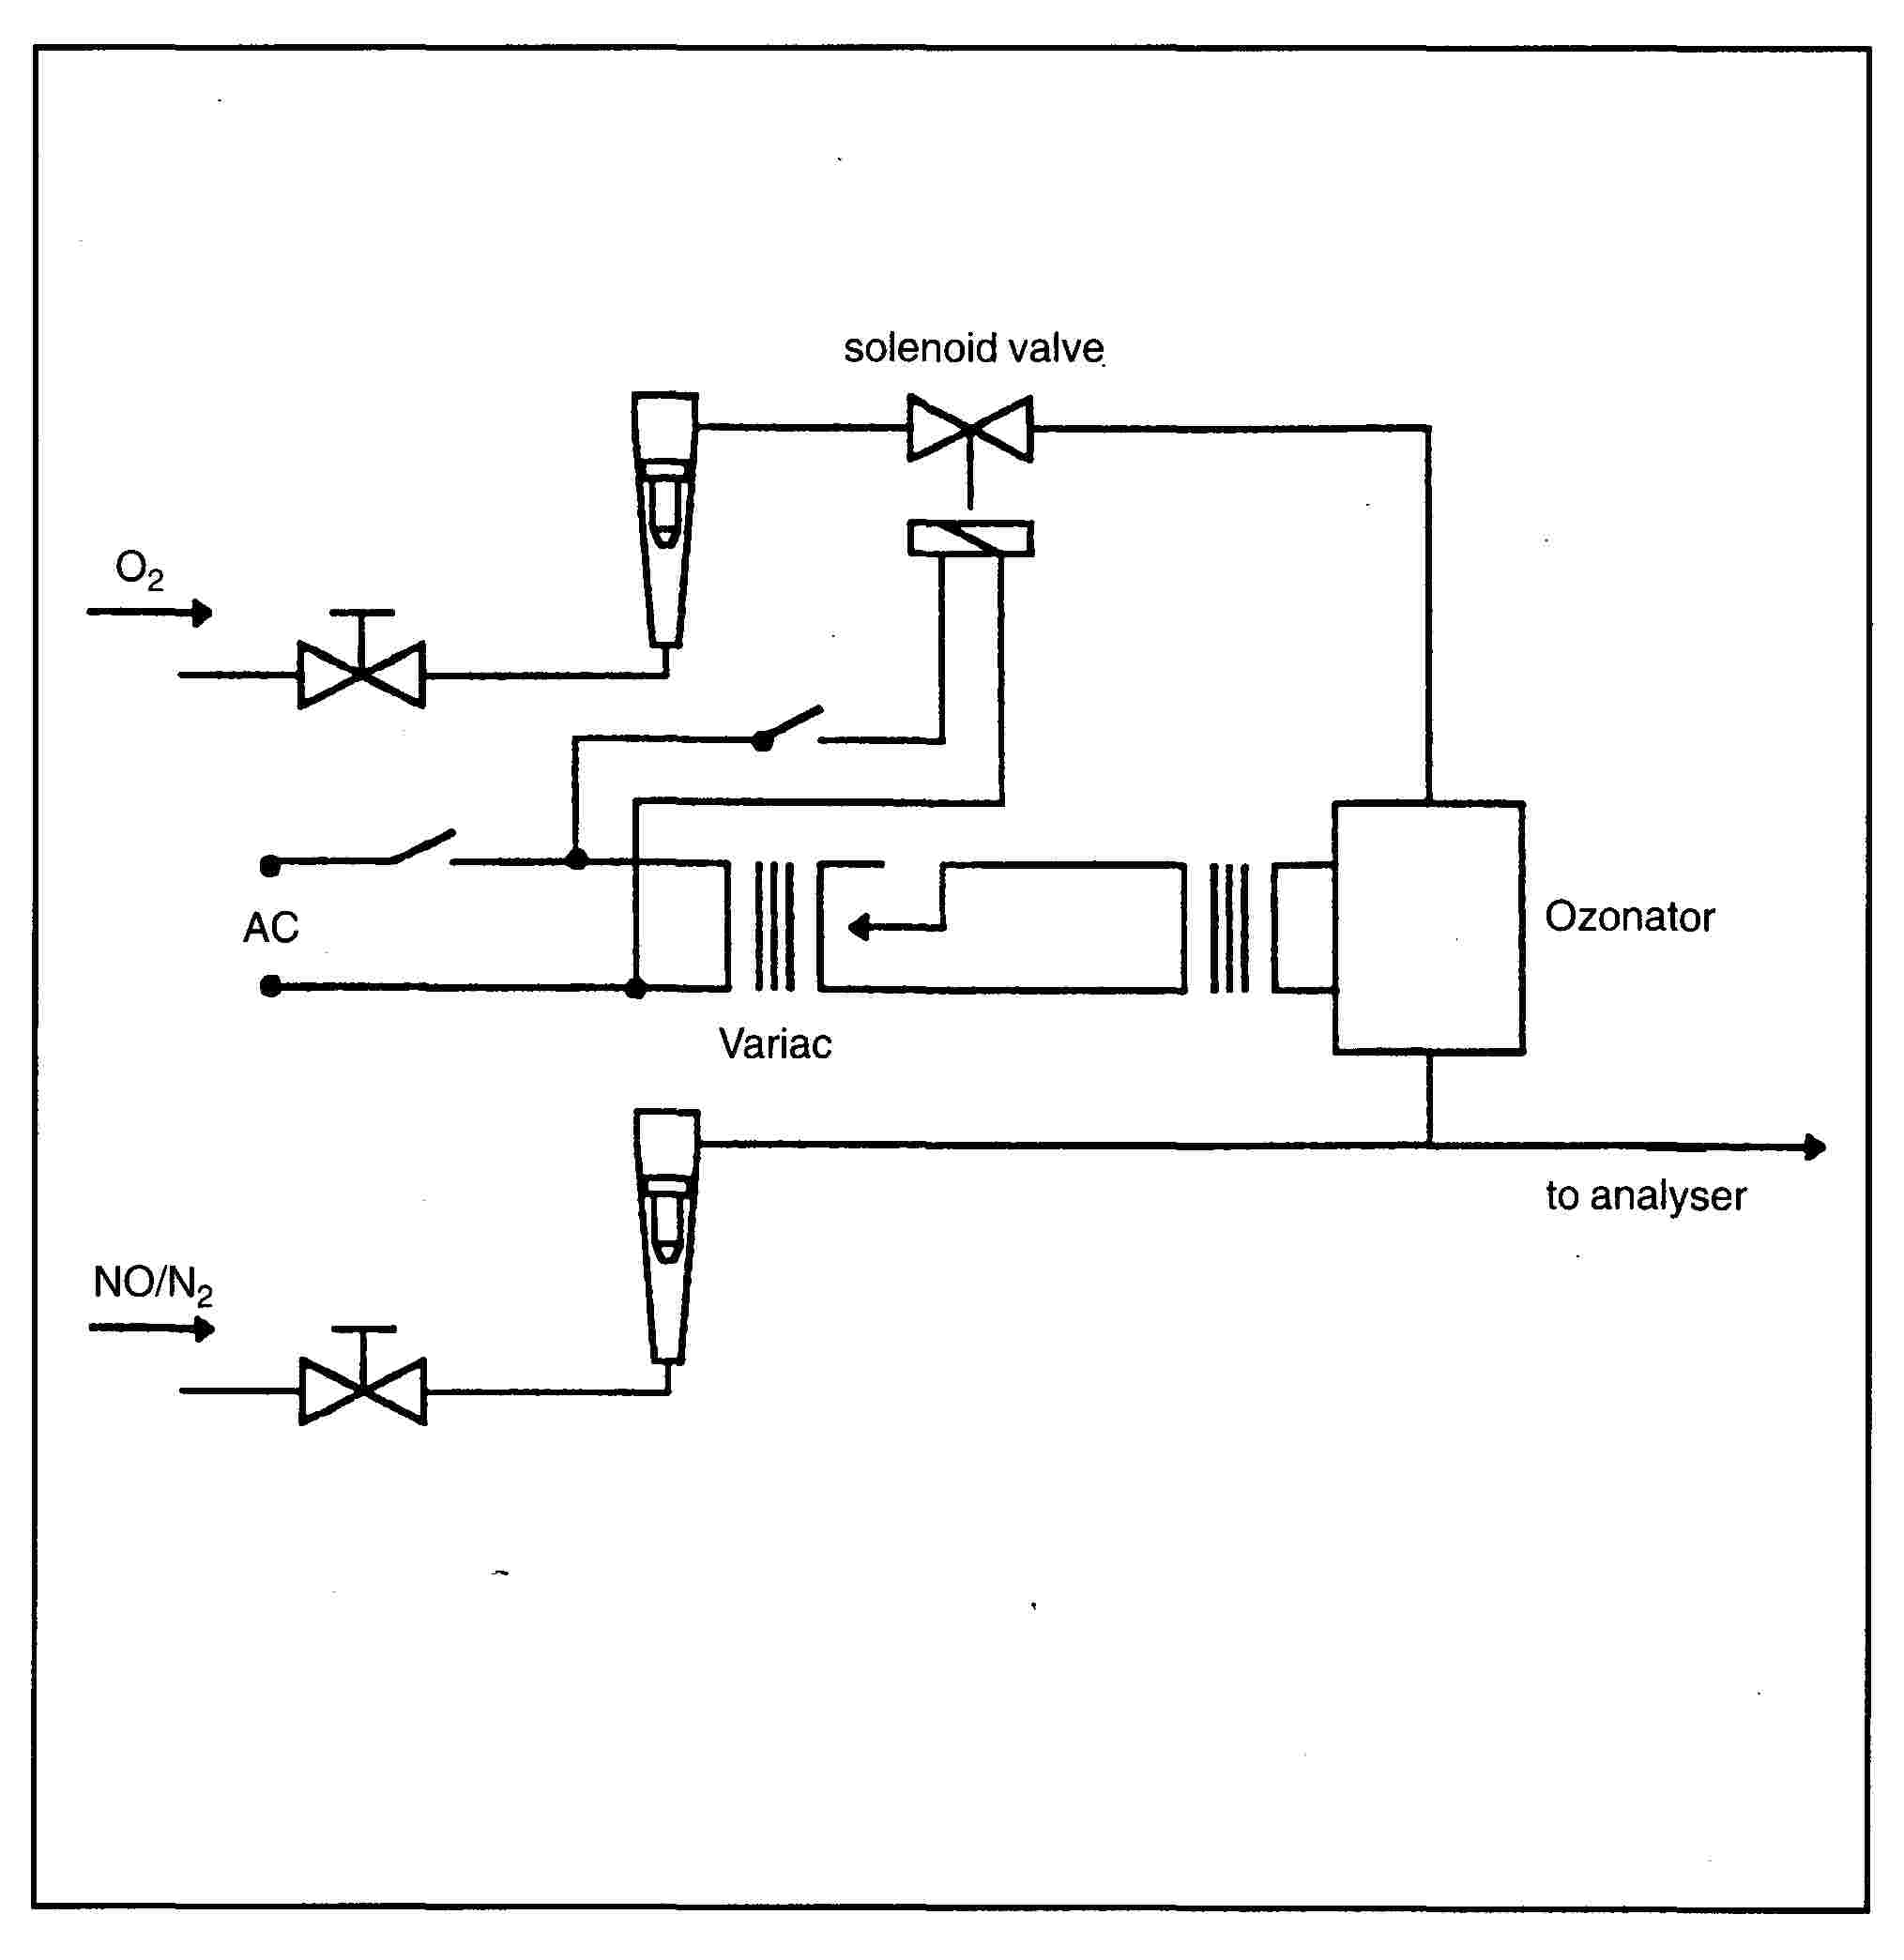 Eur Lex 01997l0068 20040520 En International 464 Tractor Wiring Diagram Figure 1 Schematic